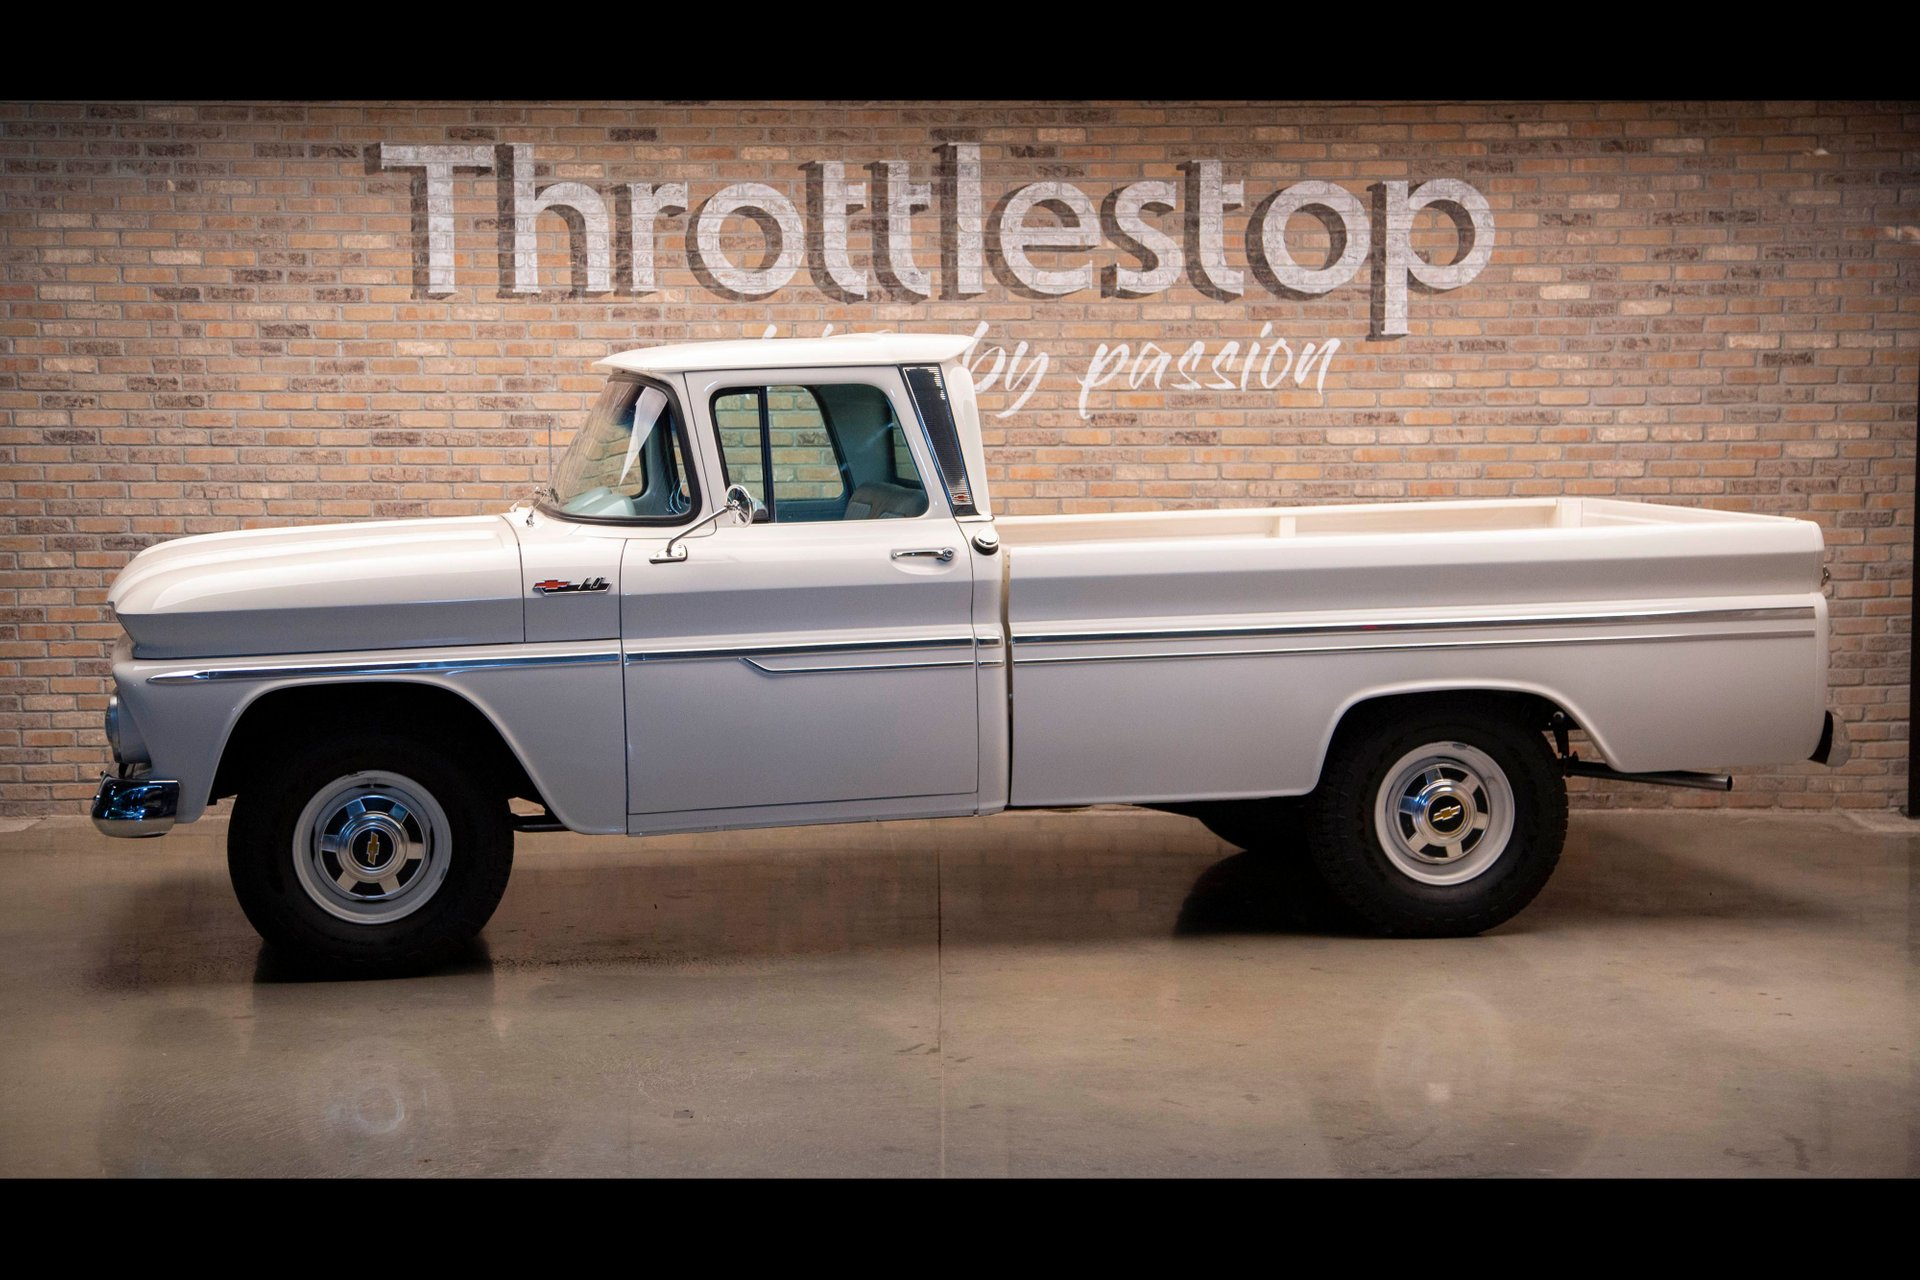 1962 chevrolet c10 fleetside long box pickup